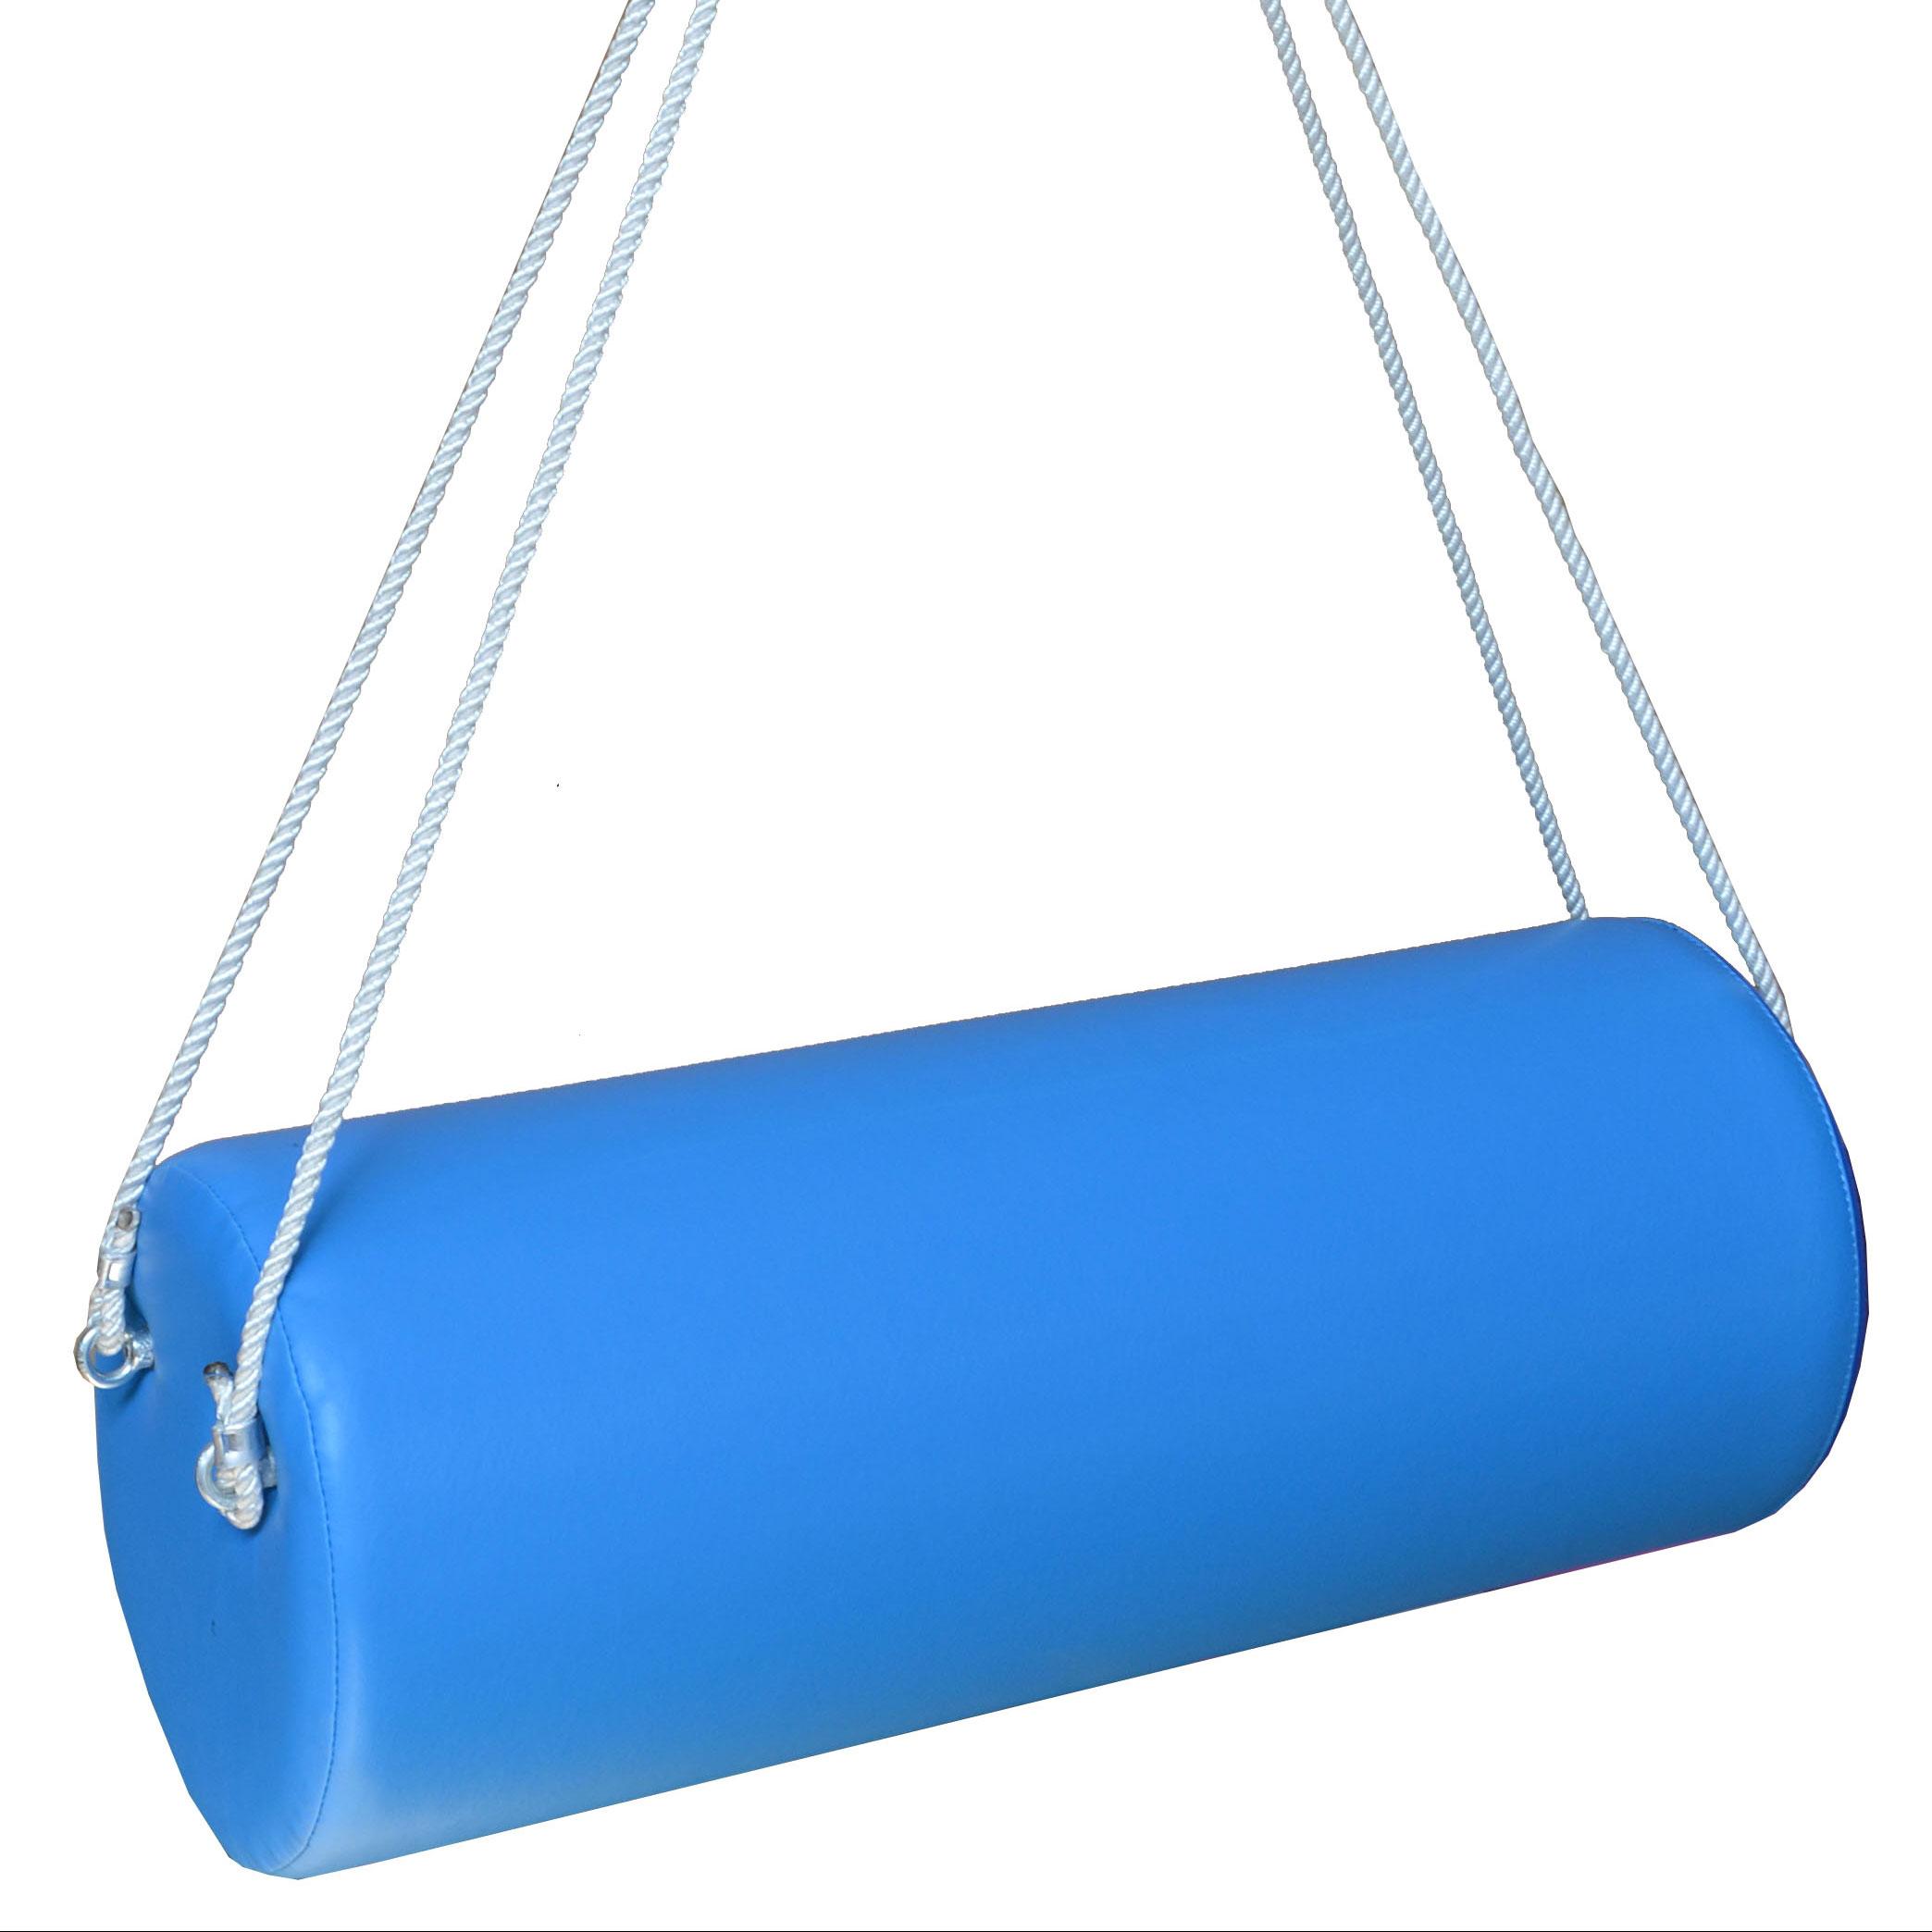 Blue Bolster Swing Heavenly Hammocks